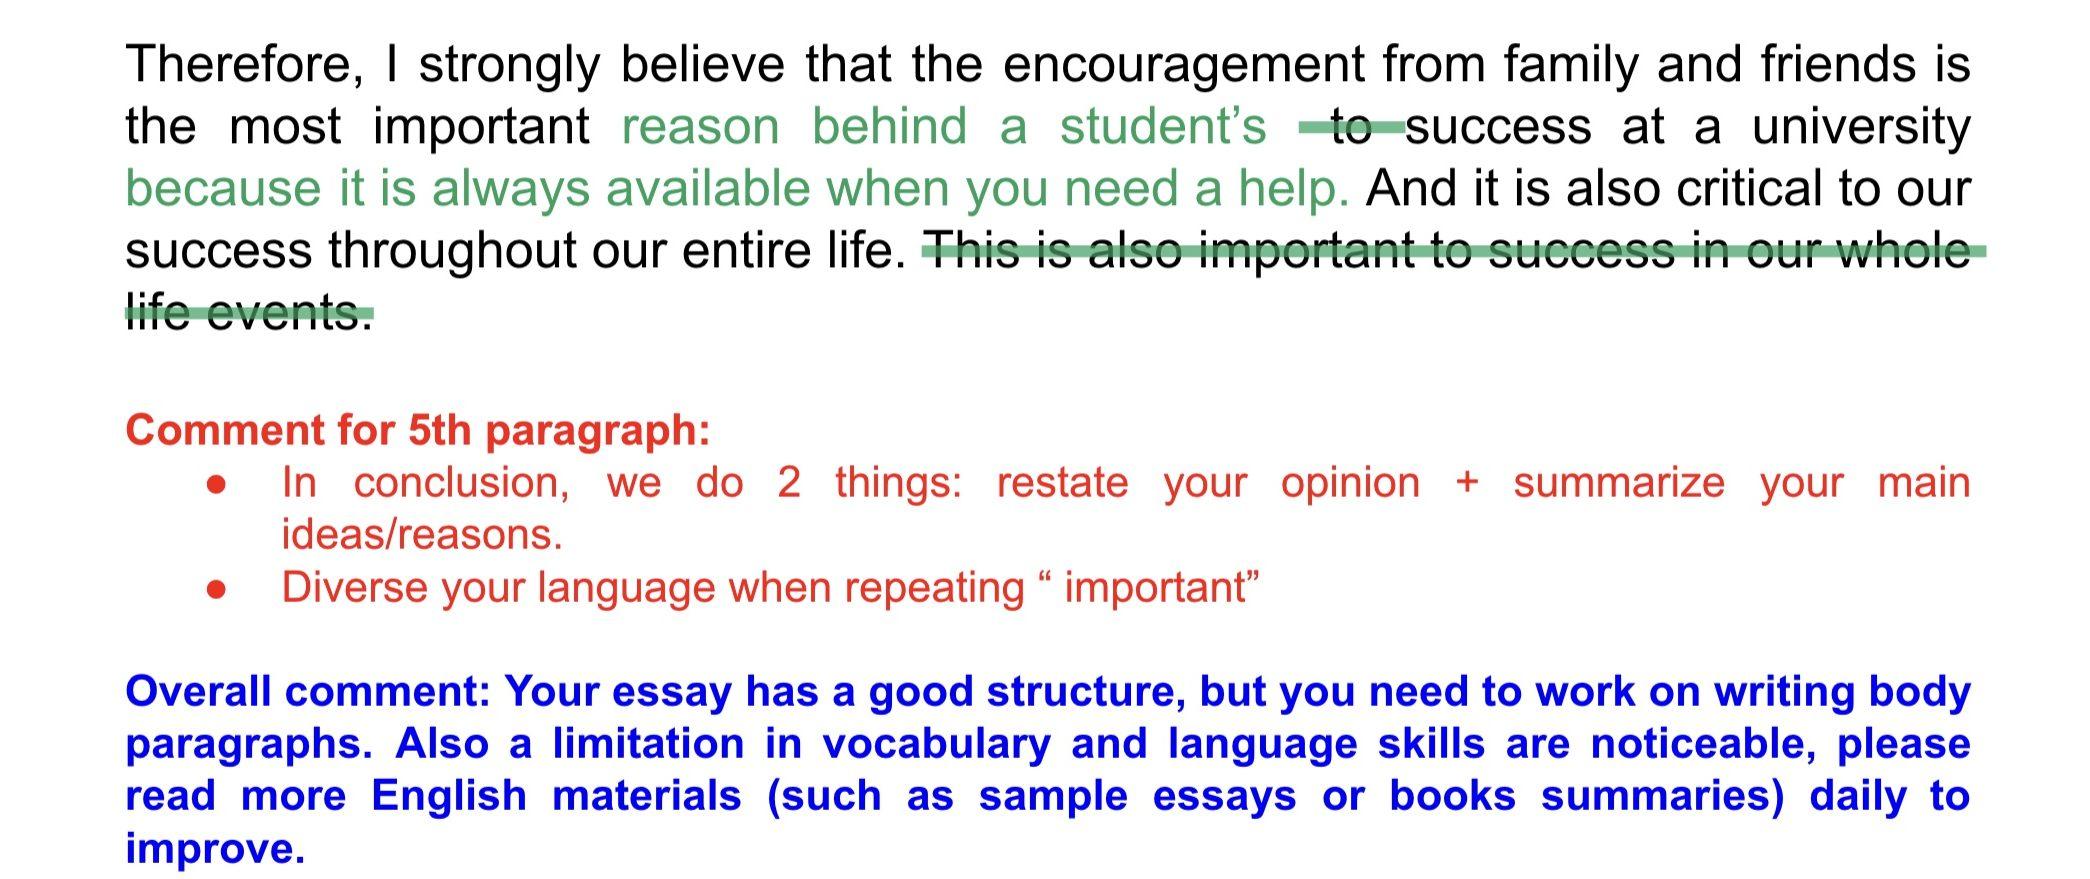 TOEFL ライティング 添削例 コンクルージョン